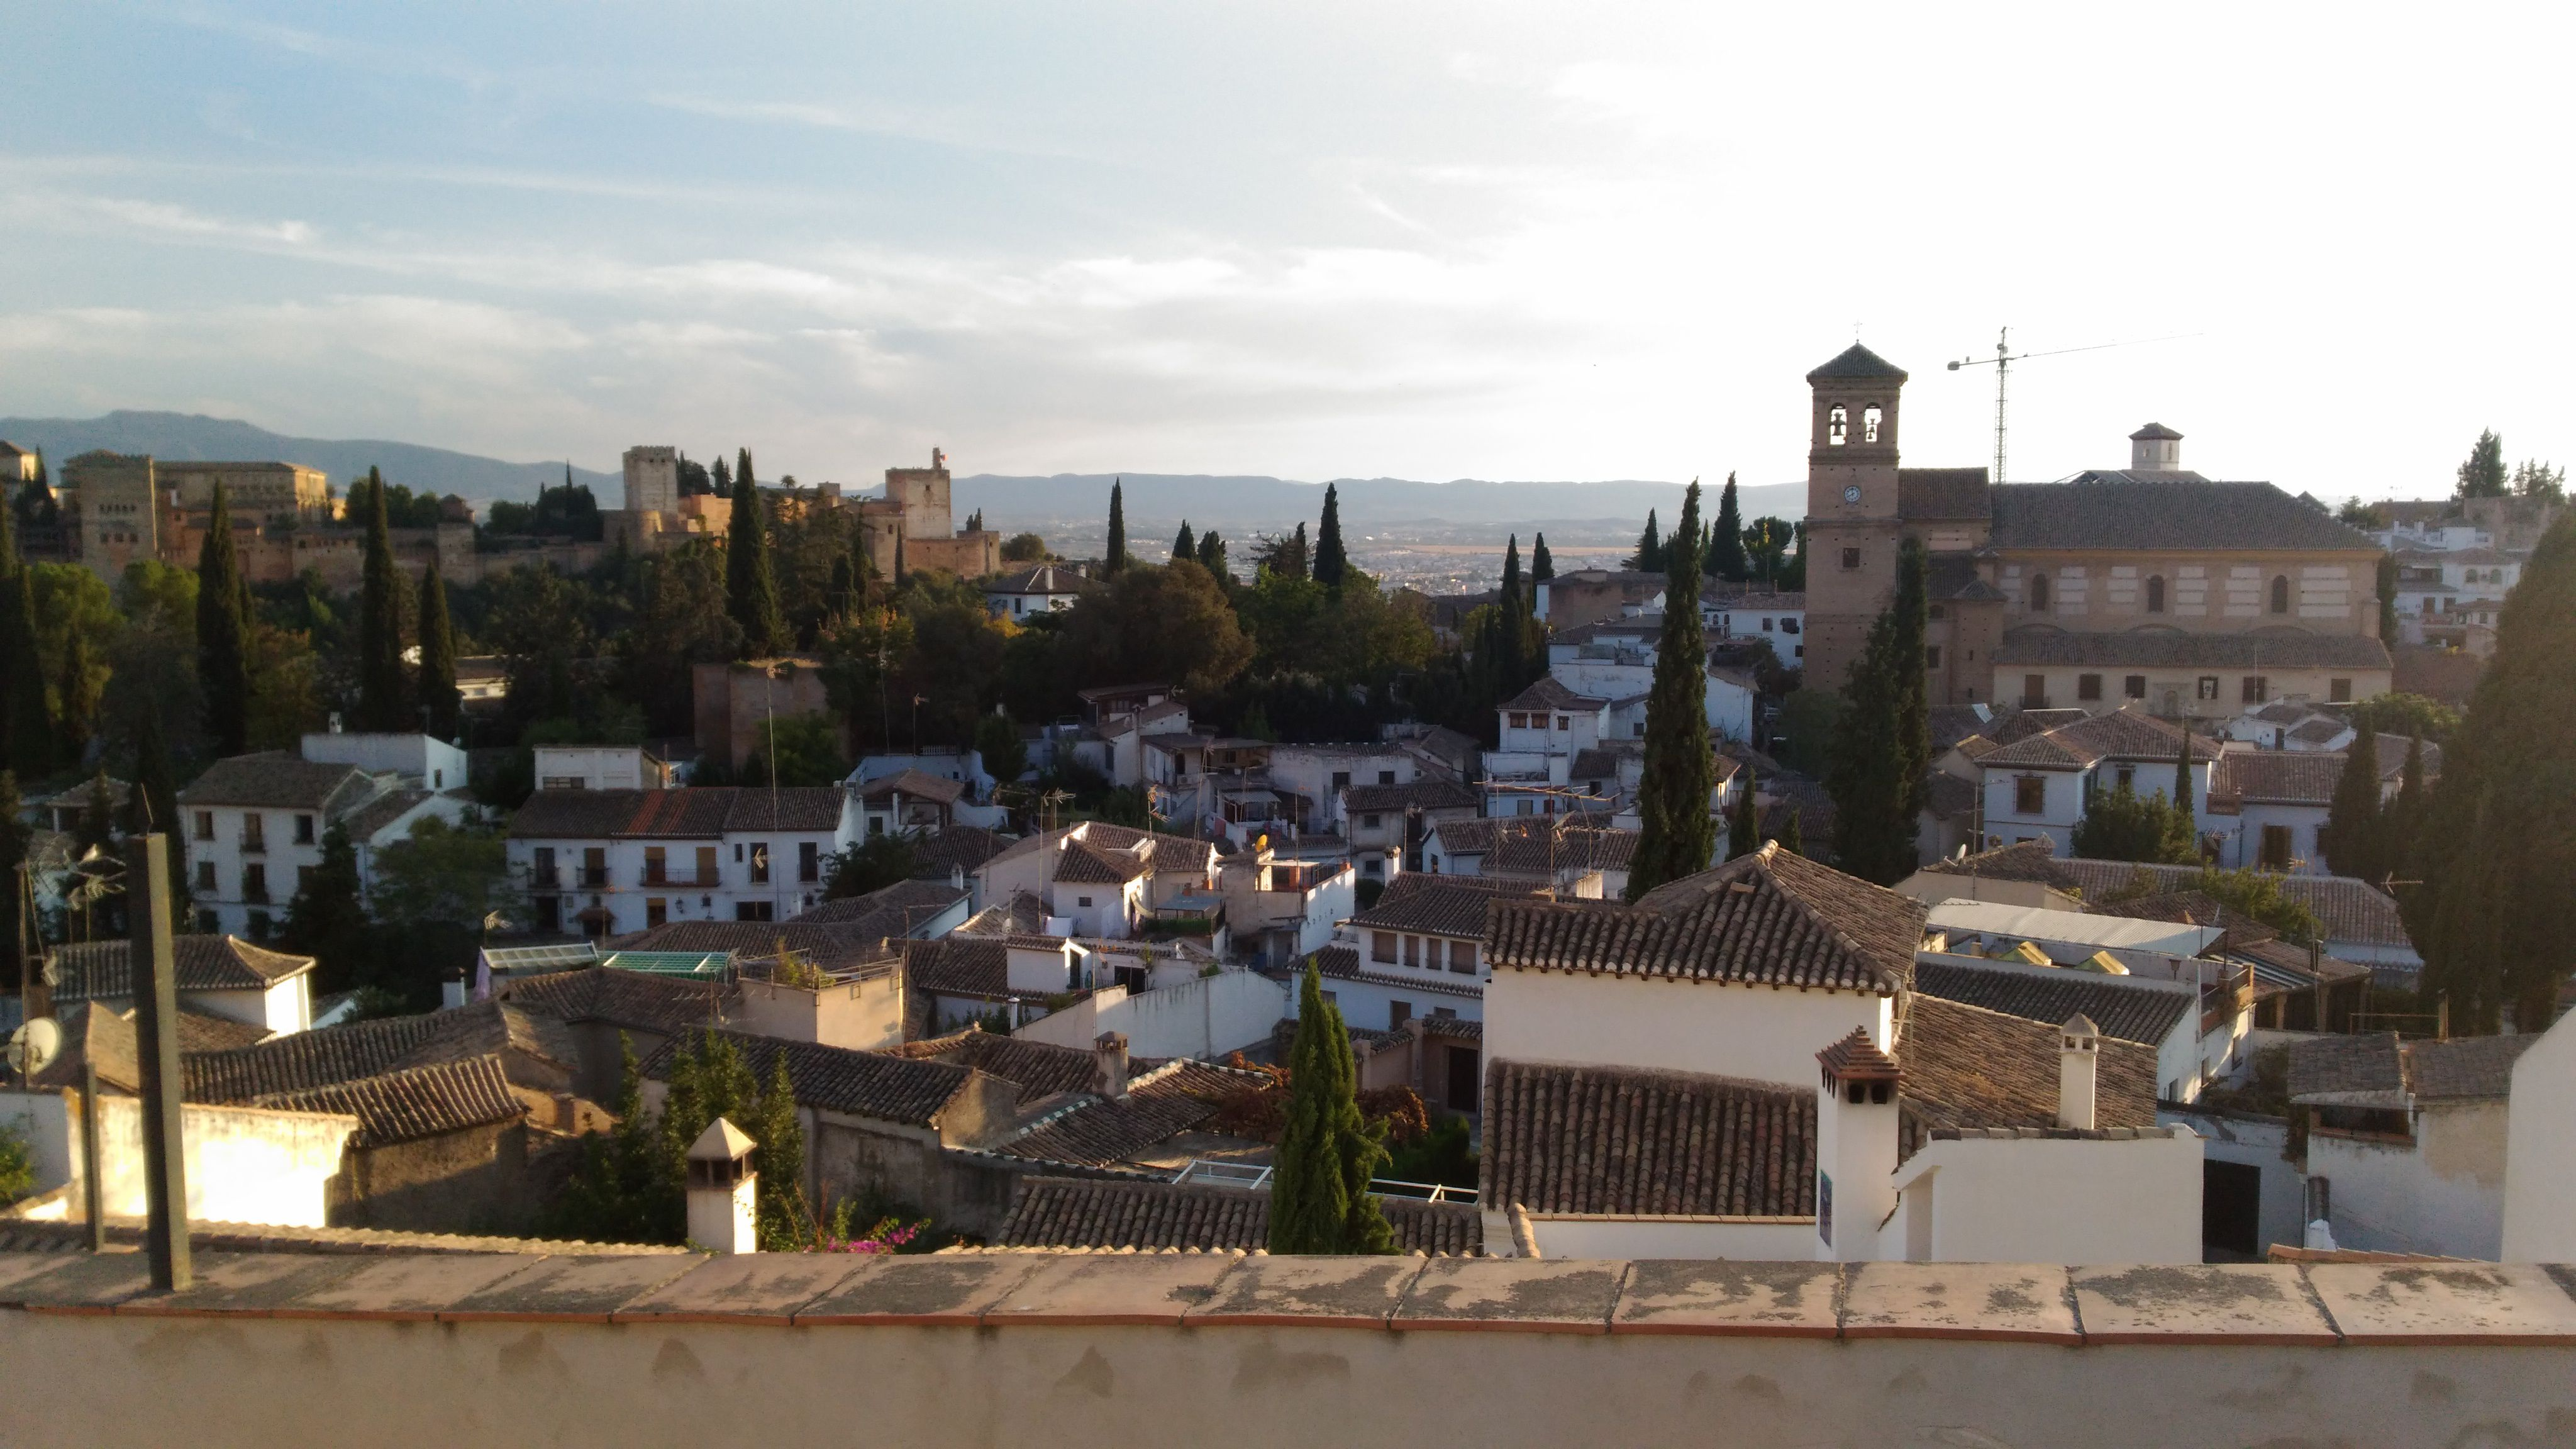 Granada'dan bir başka manzara